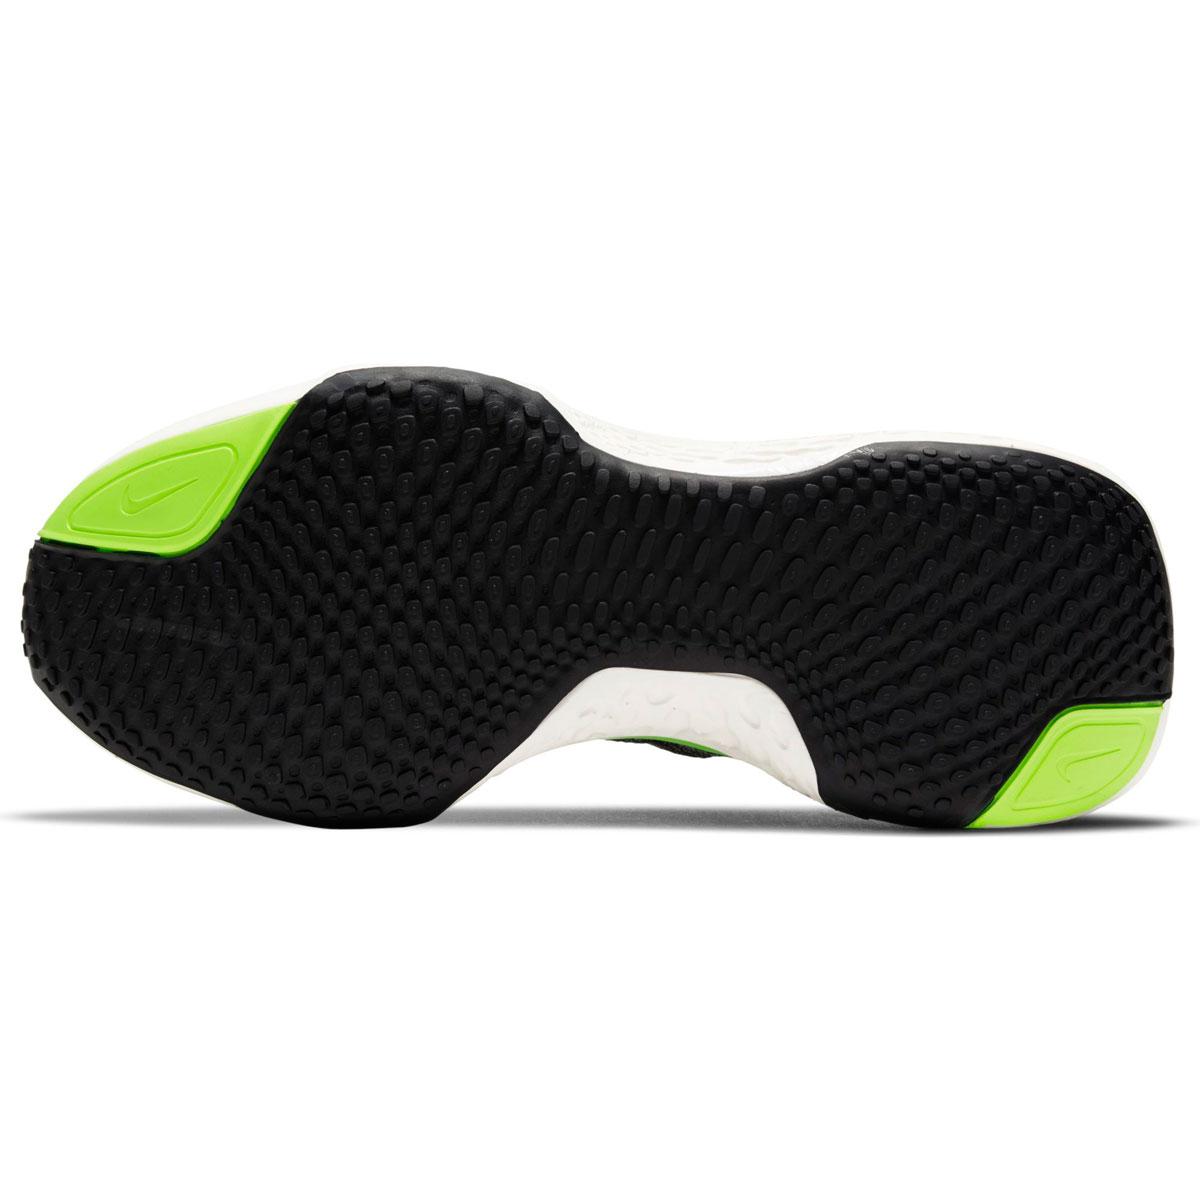 Women's Nike Zoomx Invincible Run FlyKnit Running Shoe - Color: Black/Cyber/Elemental Pink - Size: 6 - Width: Regular, Black/Cyber/Elemental Pink, large, image 6